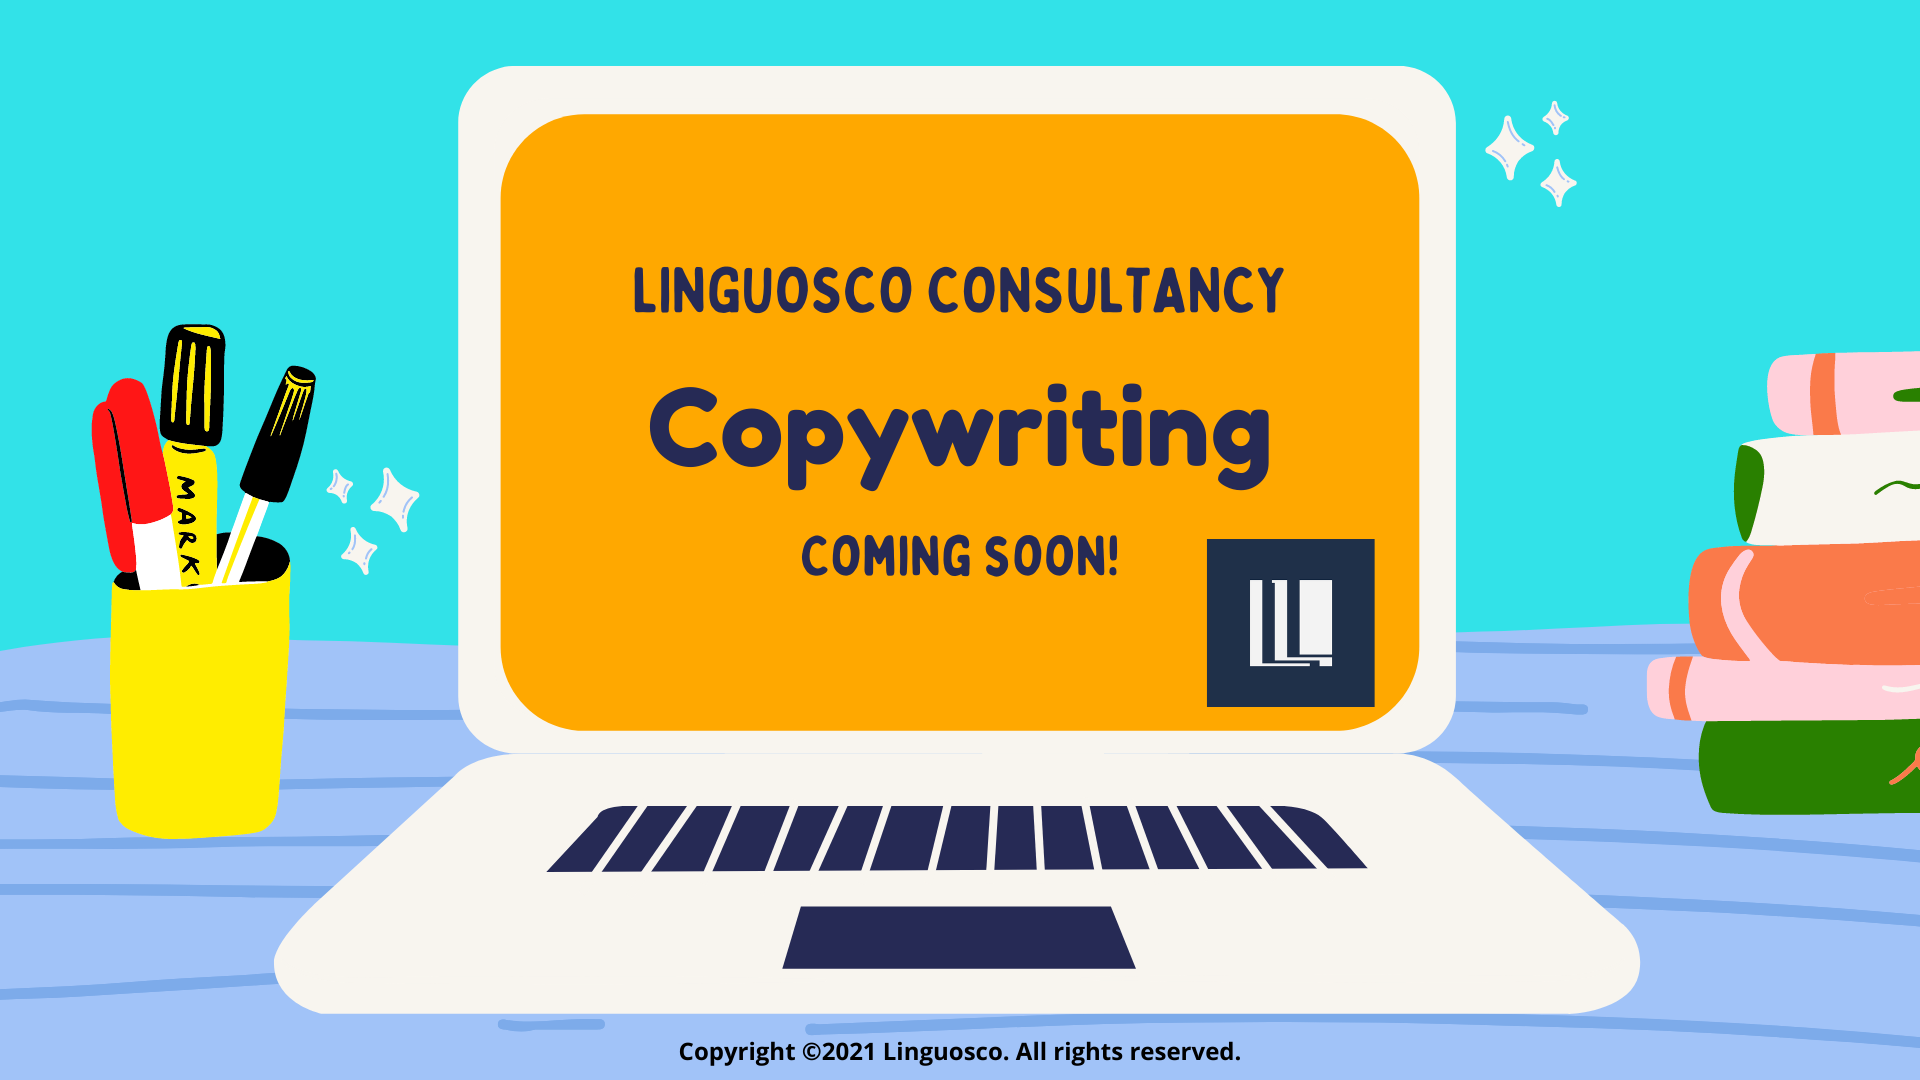 Copywriting - Linguosco